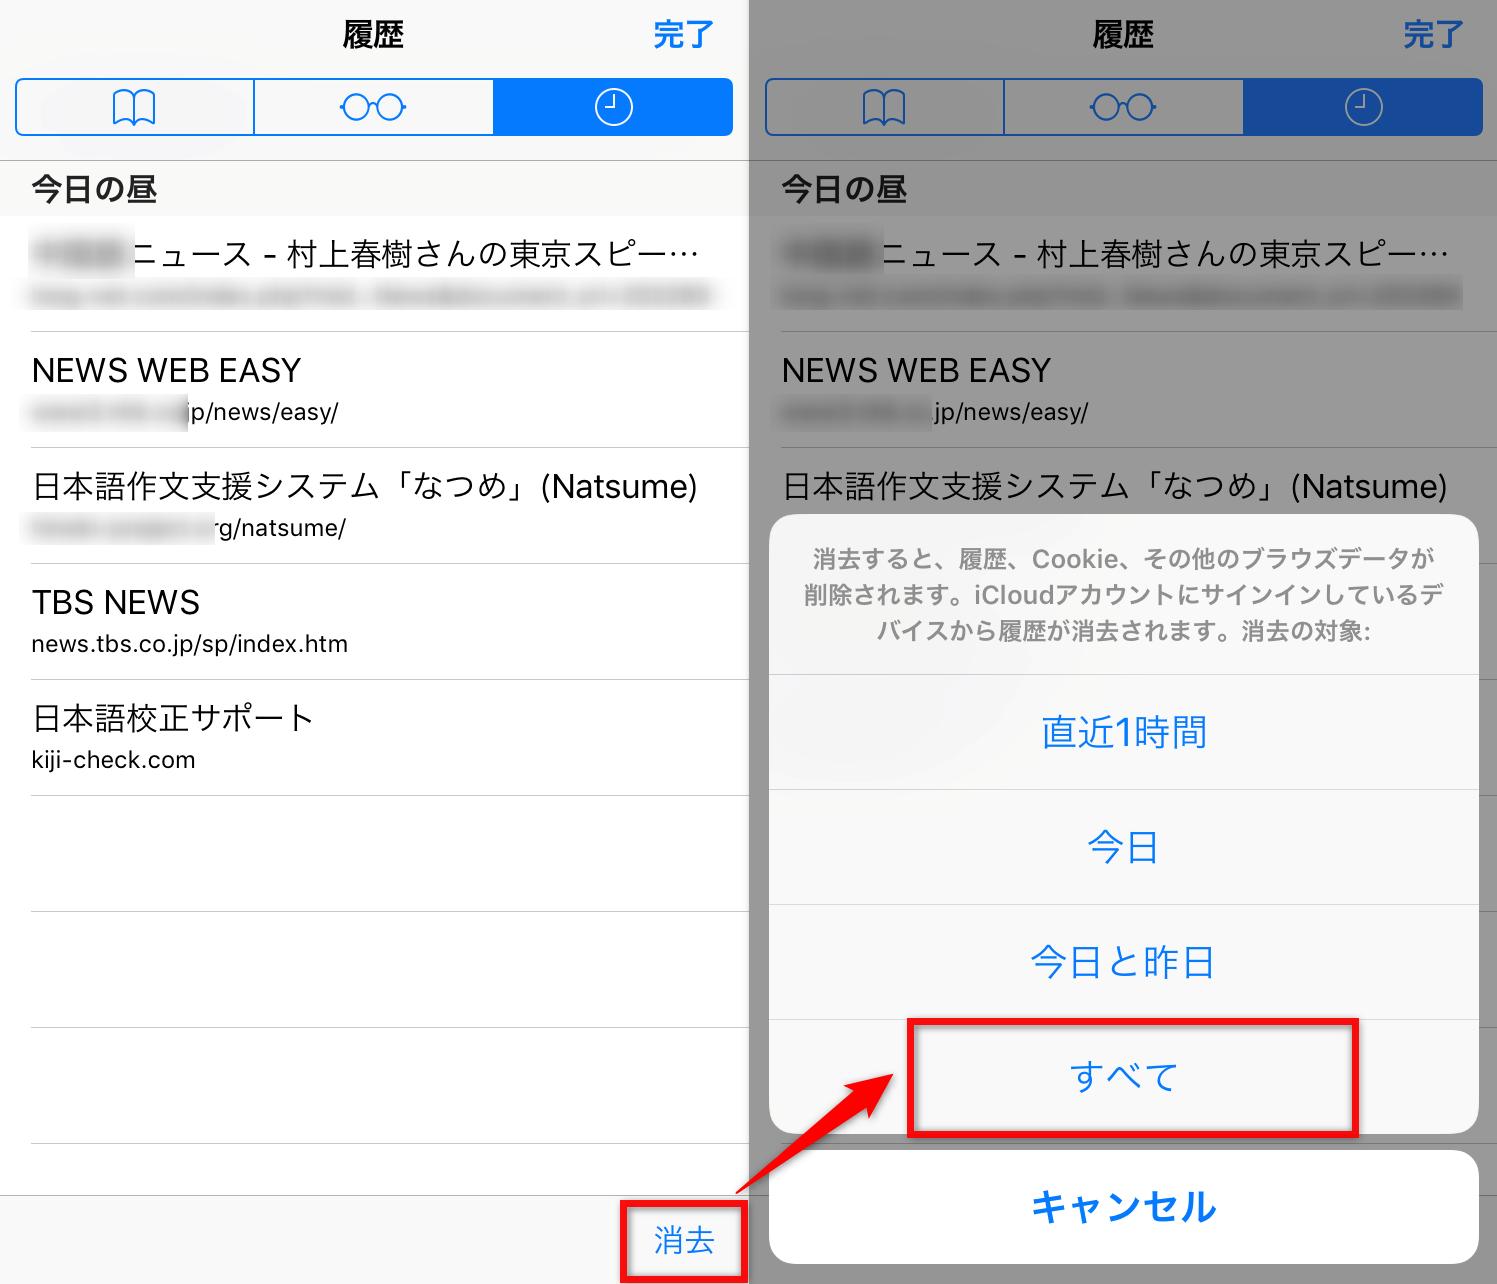 iOS 12.3・iOS 12.2・iOS 12.1・iOS 12端末(iPhone X/8/7/6s/6/5s) - Safariの提案機能が動作しない